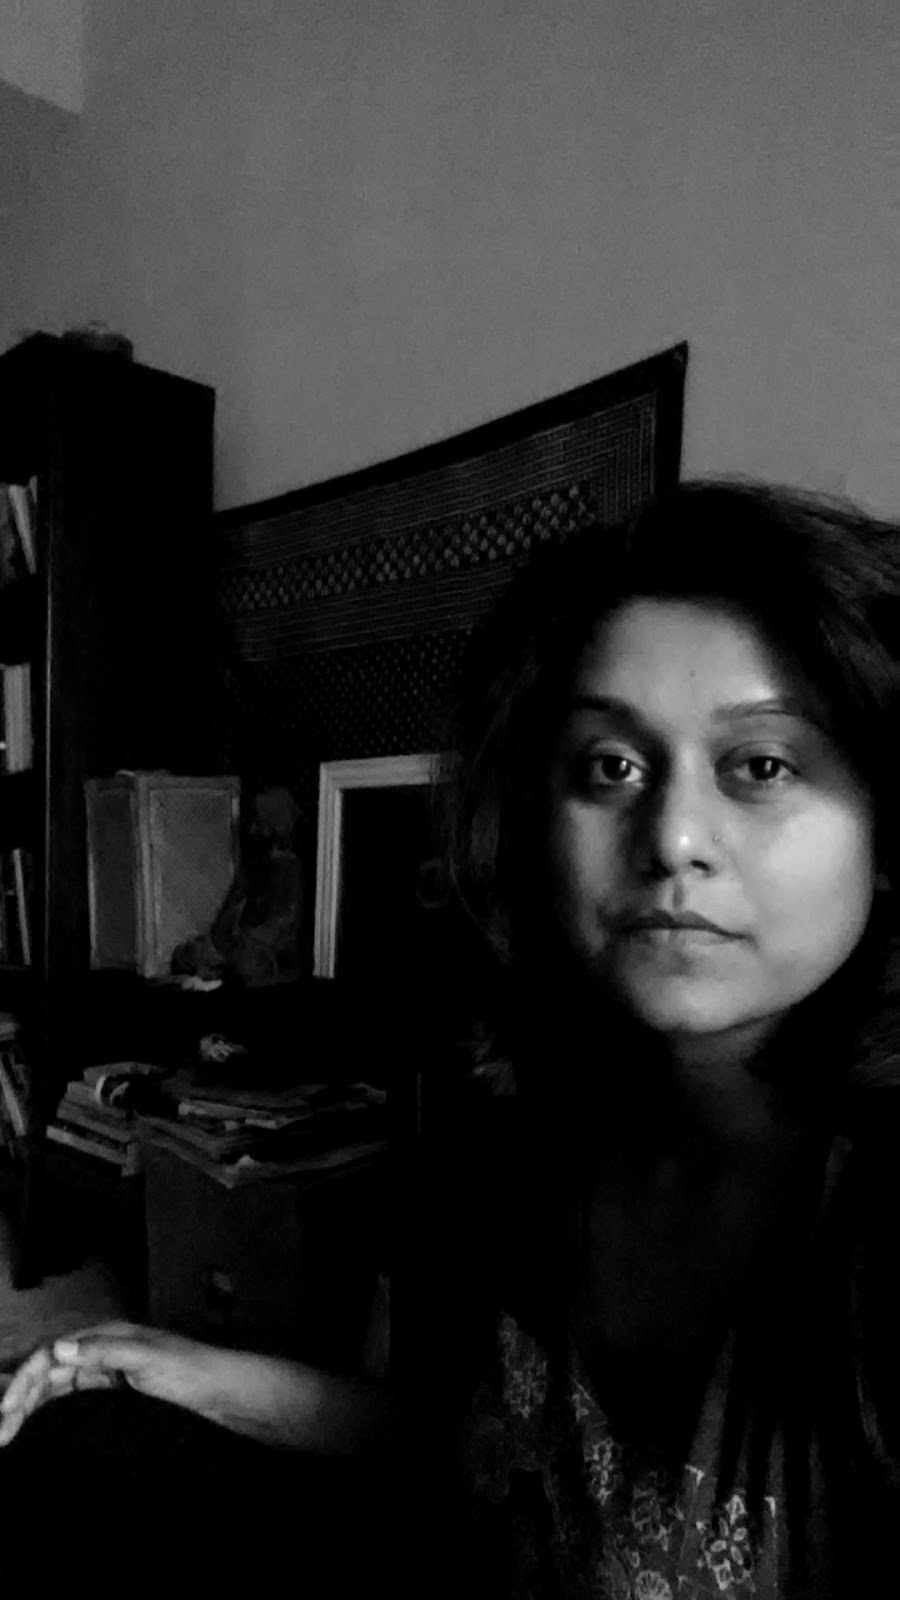 Interview: Meet Priya Vadhyar